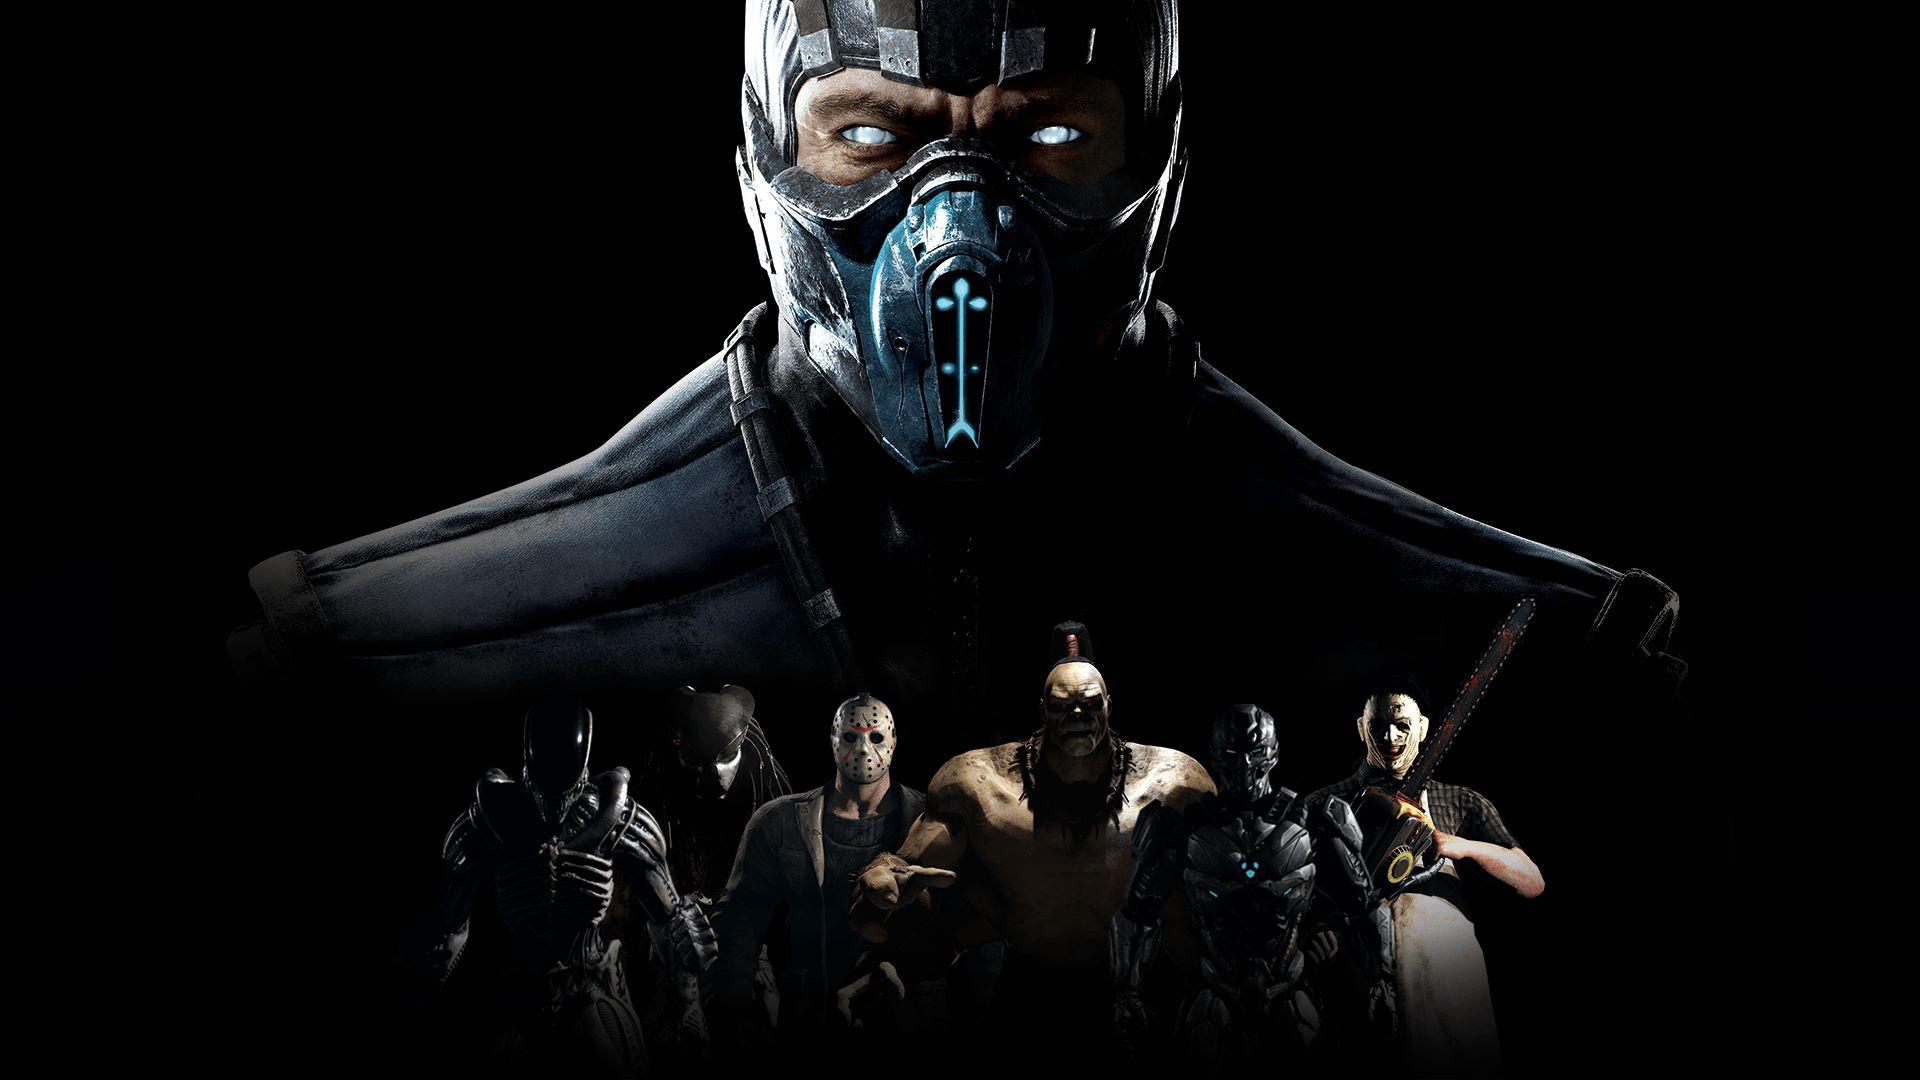 Mortal kombat 4 game free download for windows 7 | Mortal